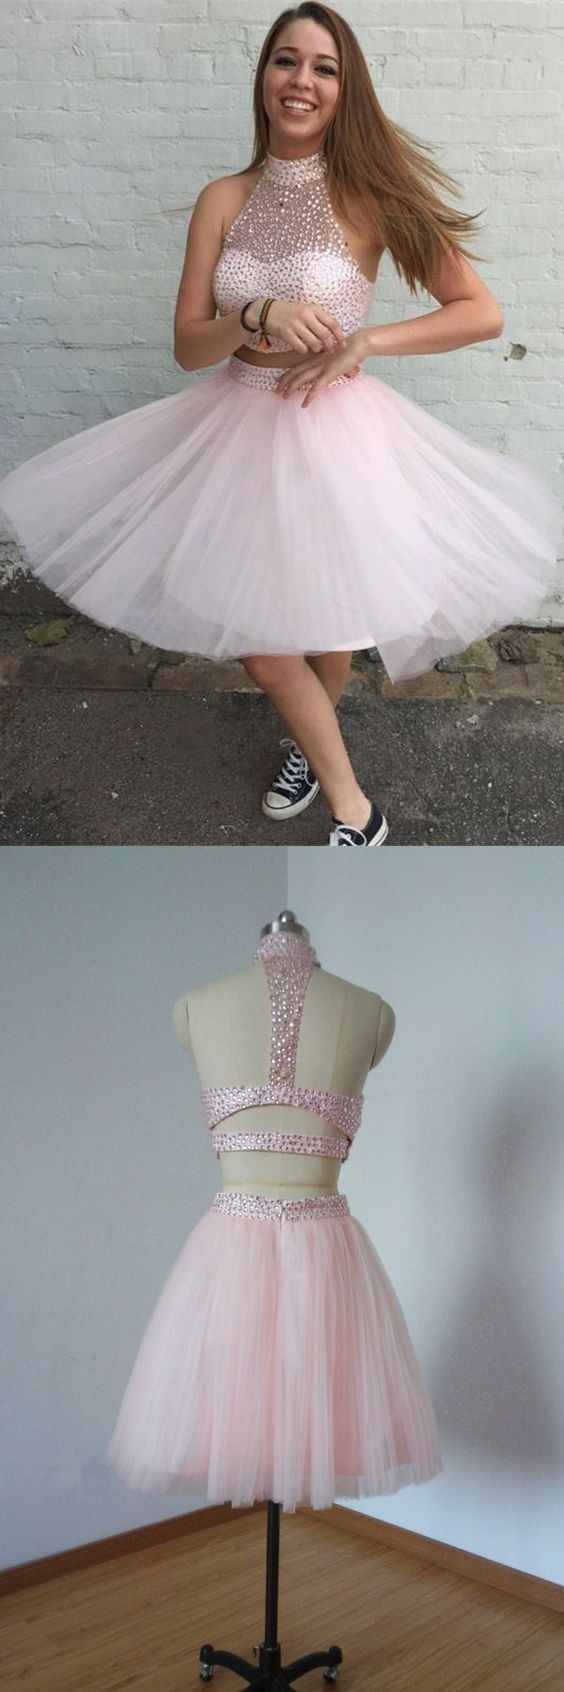 3186 besten homecoming dresses Bilder auf Pinterest | Abschlussball ...